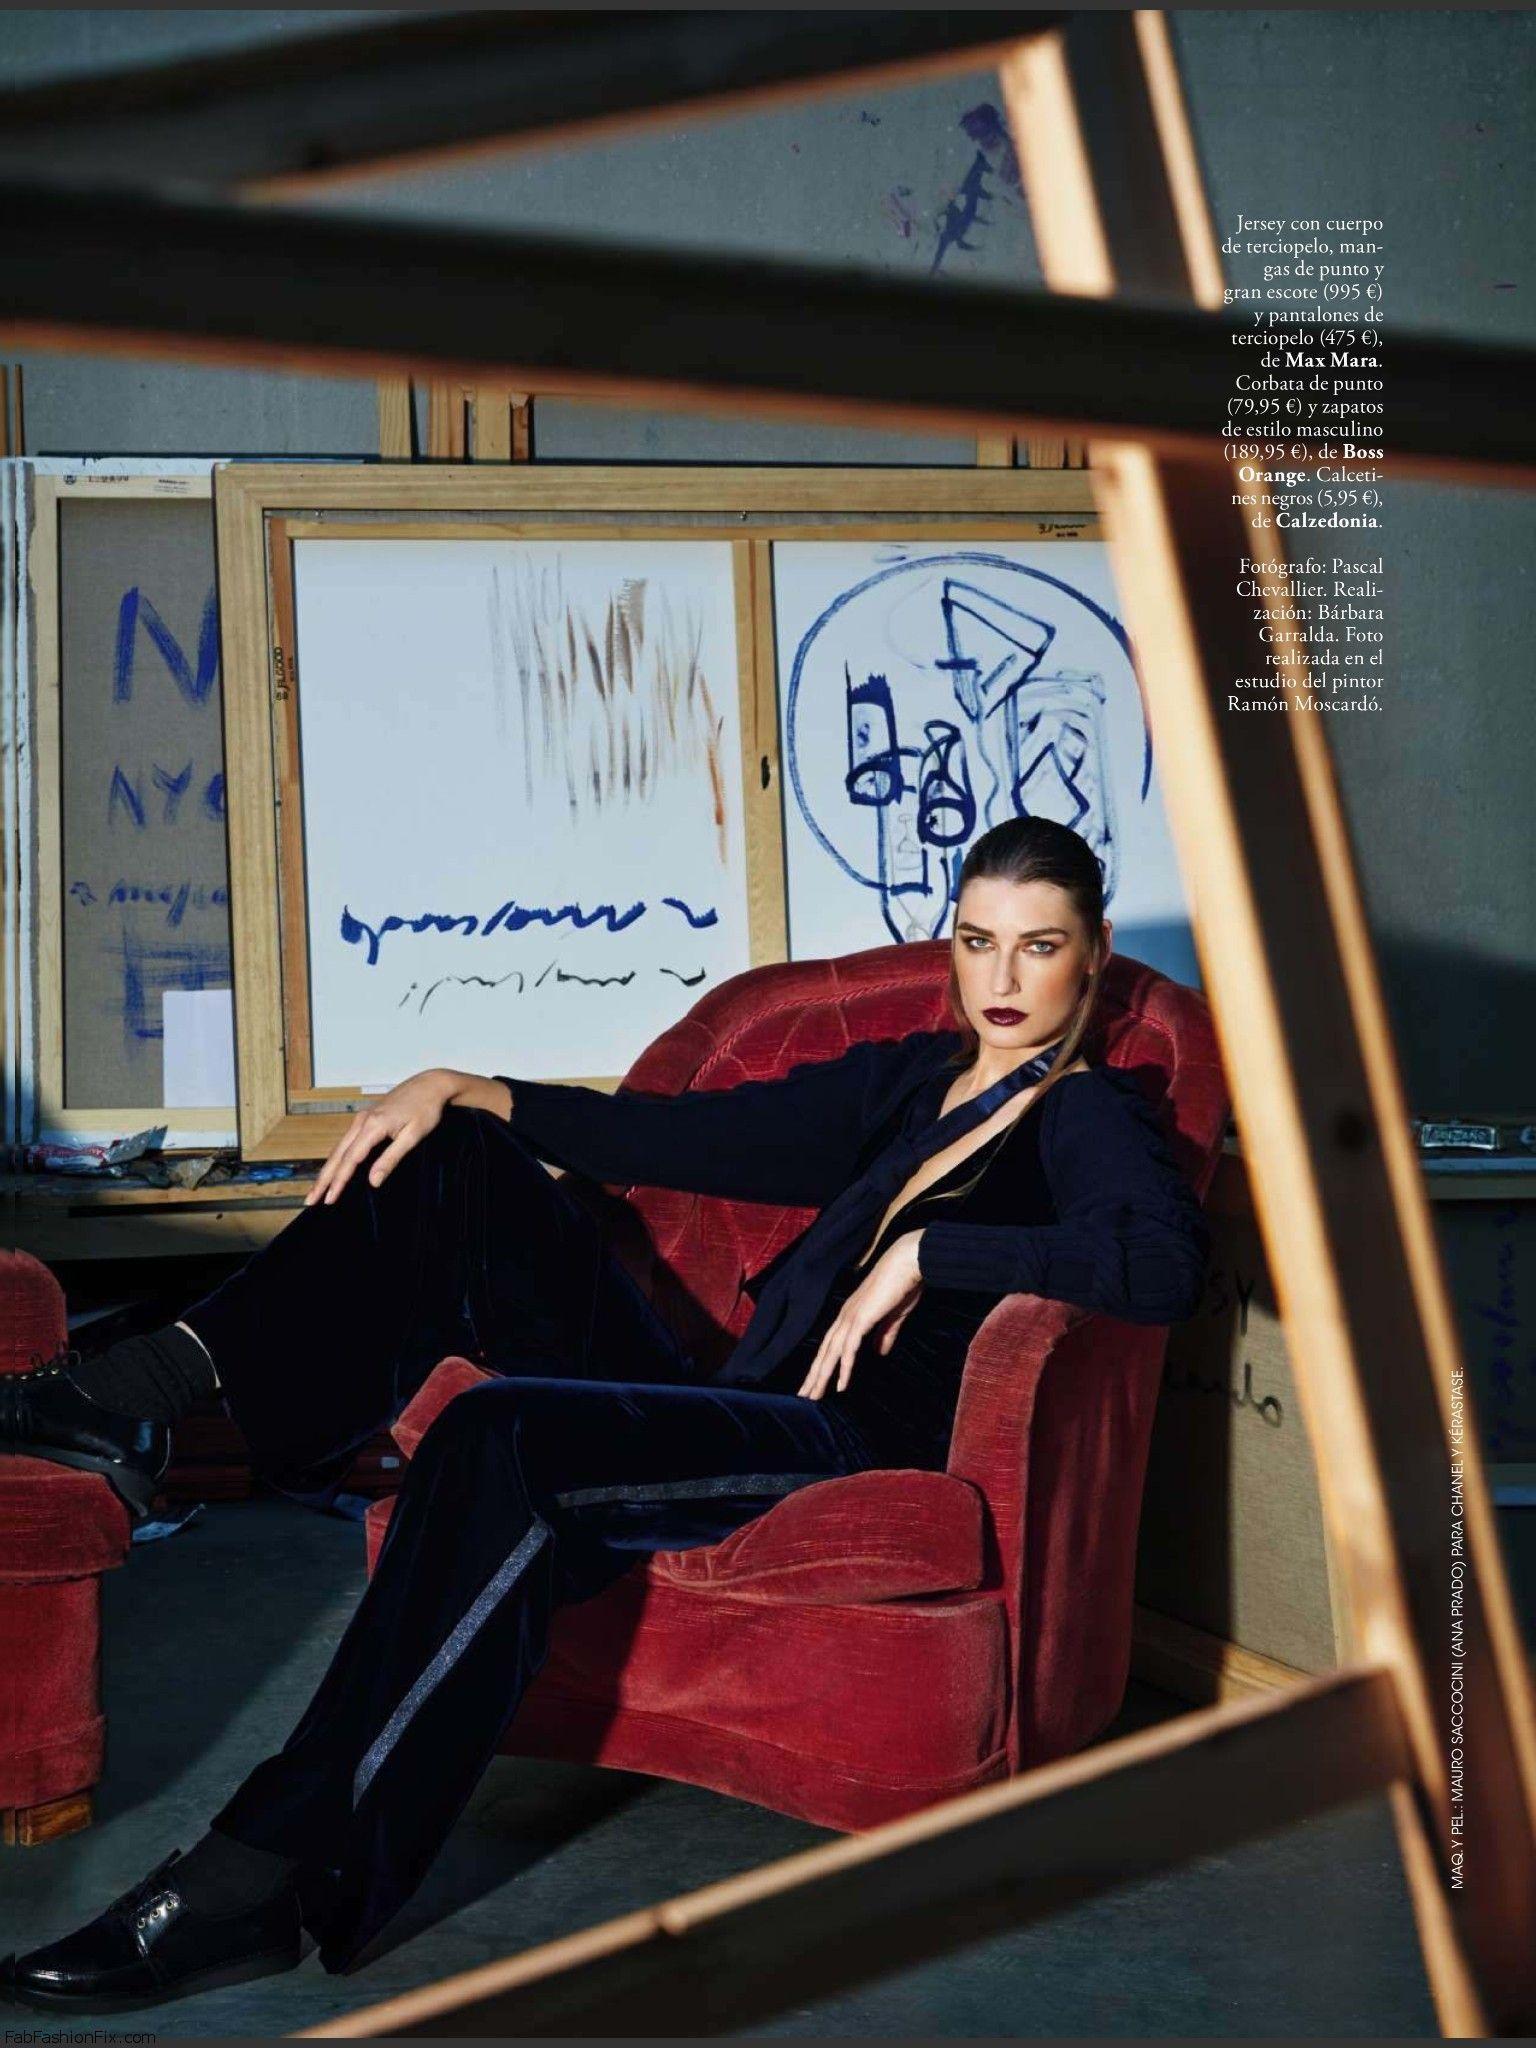 fashion_scans_remastered-eugenia_volodina-elle_espana-september_2013-scanned_by_vampirehorde-hq-13